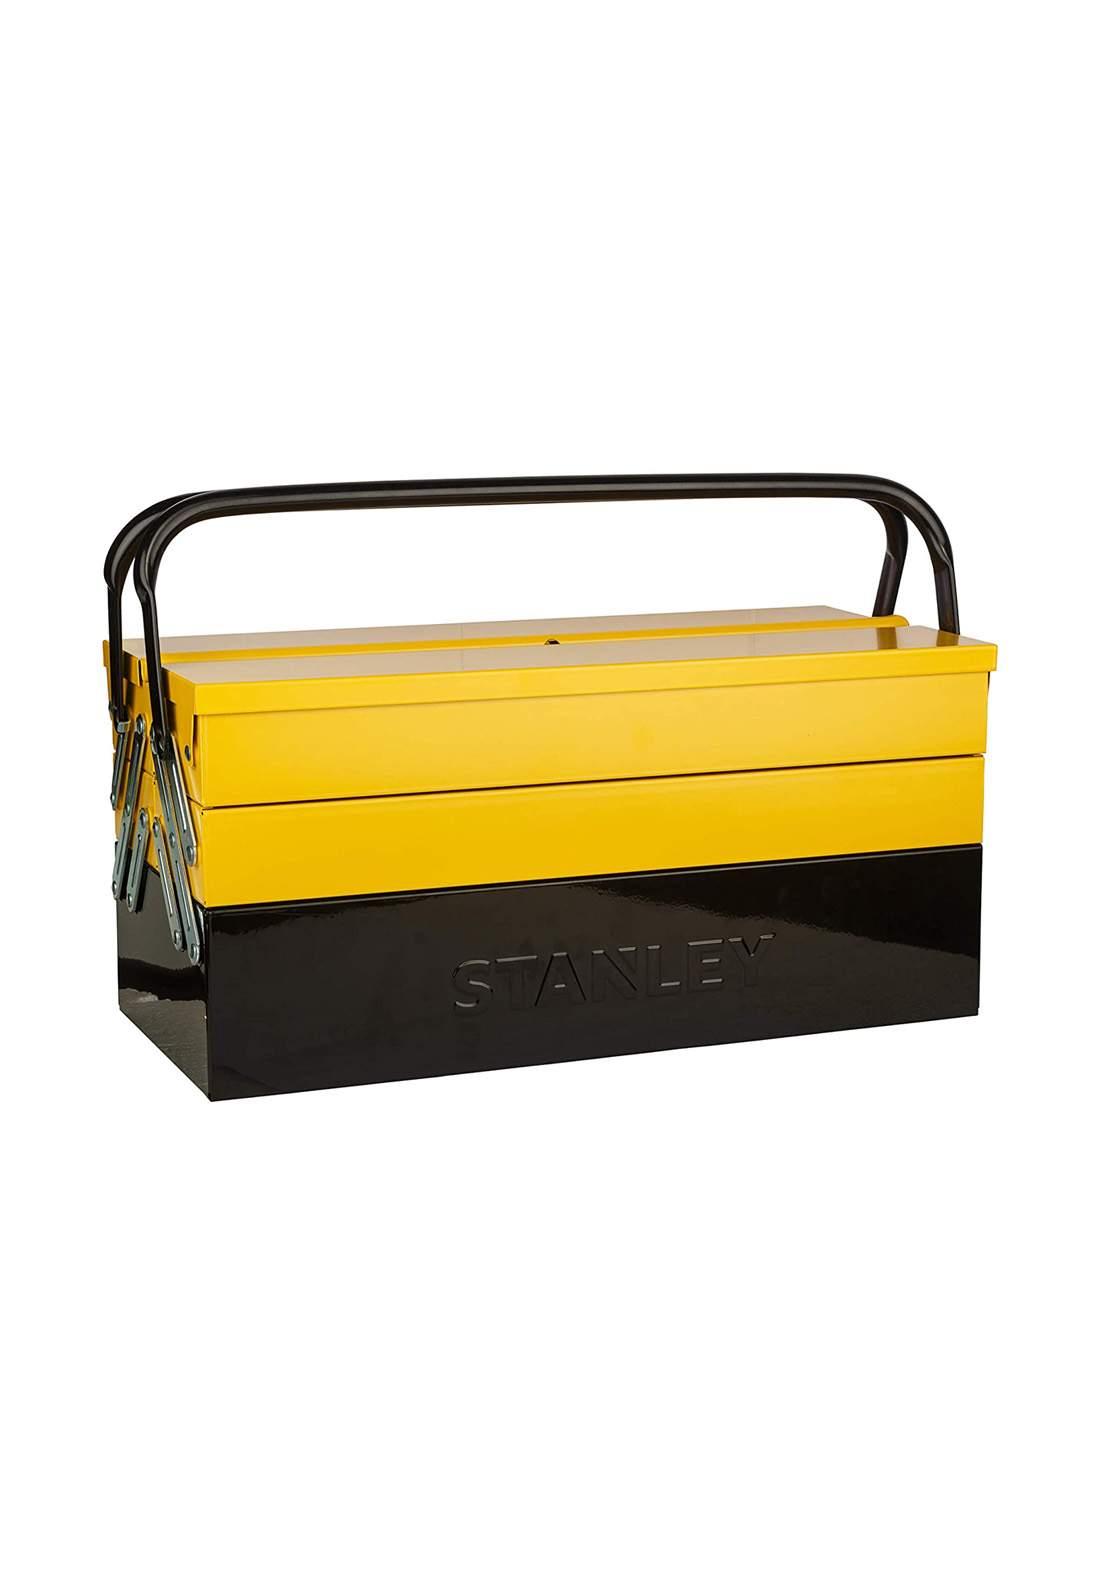 Stanley 1-94-738 Metal Toolbox صندوق ادوات معدني